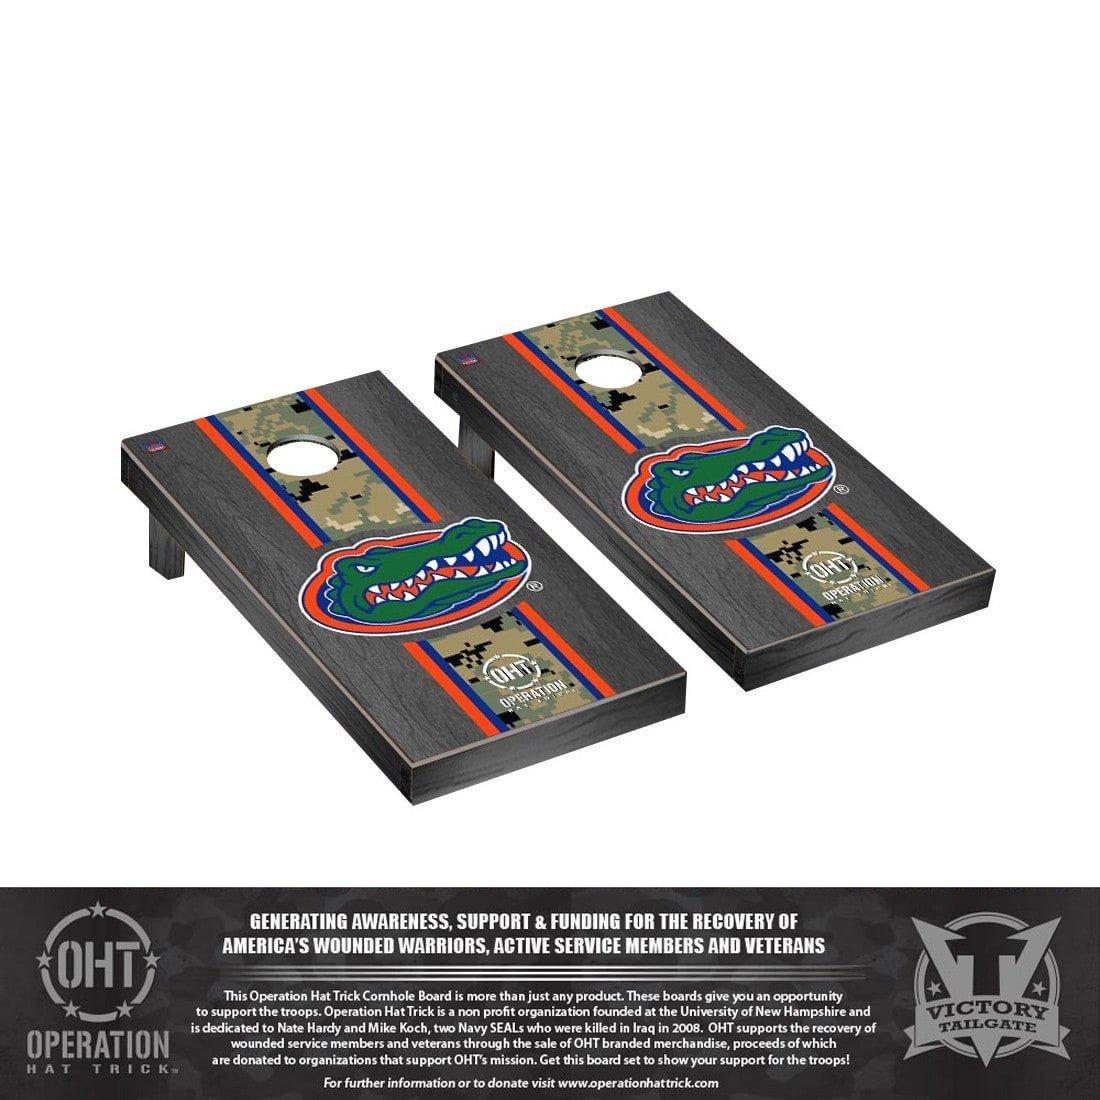 Operation Hat Trick Florida UF Gators Regulation Cornhole Game Set Onyx Stained Stripe Version by Victory Tailgate (Image #1)